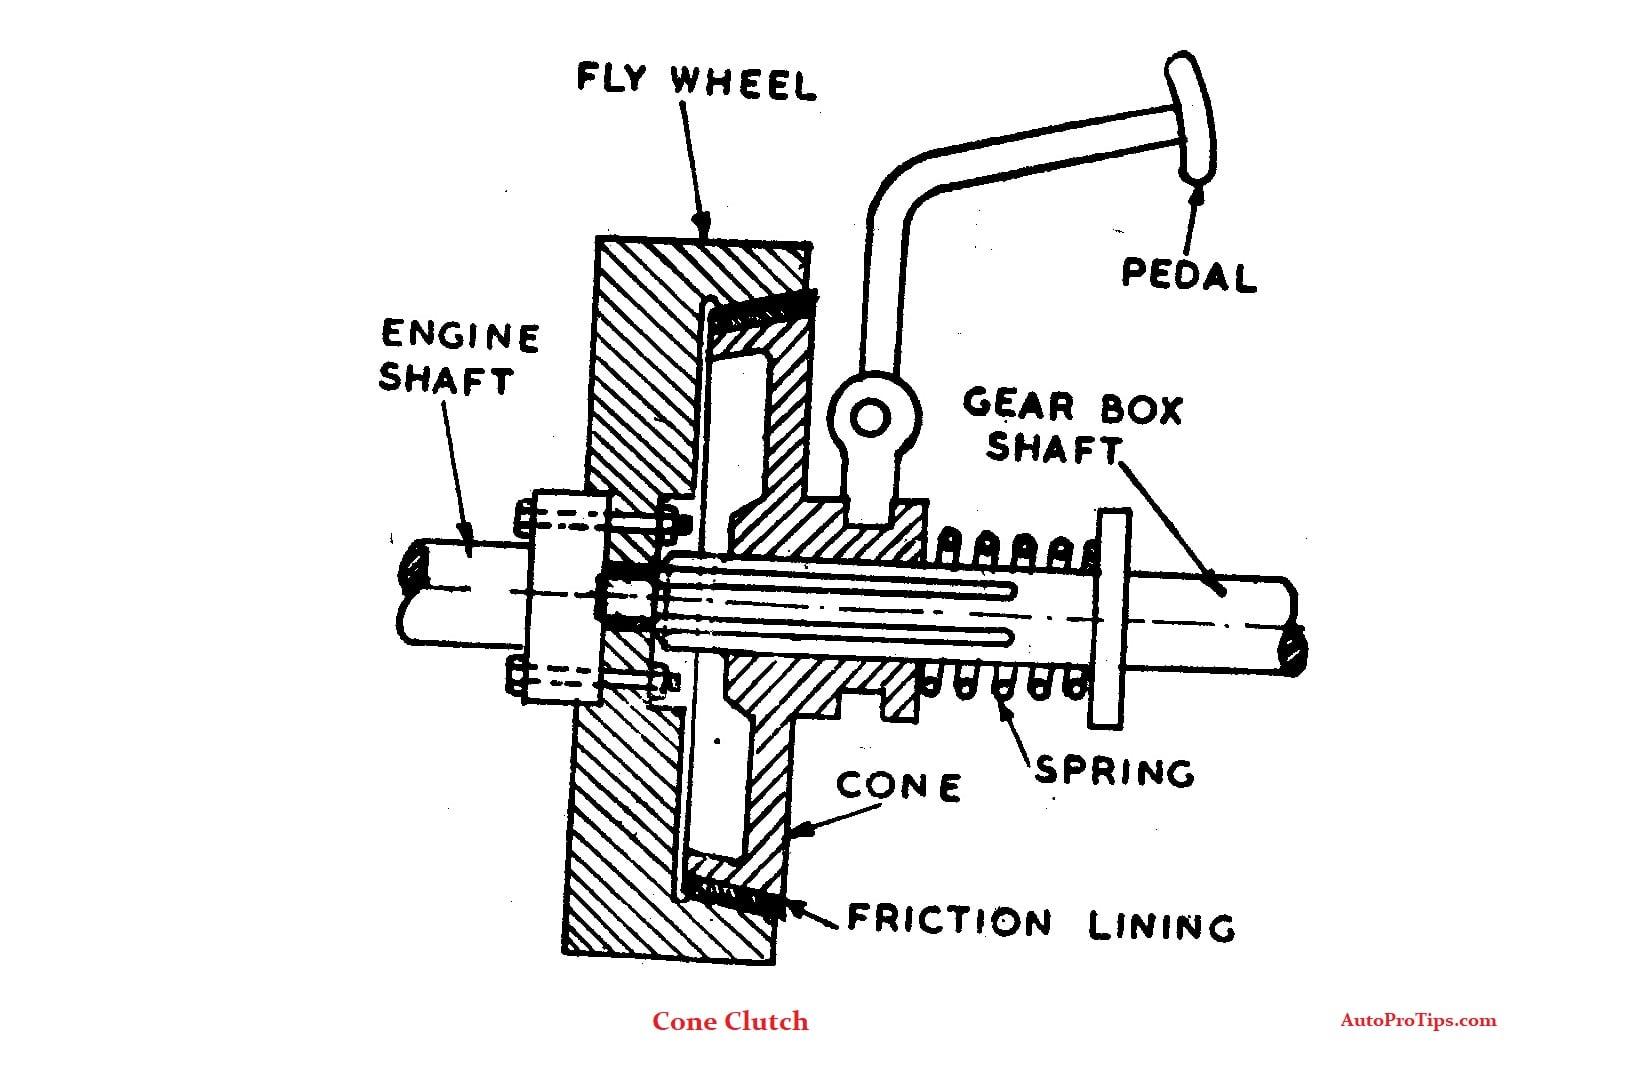 semi centrifugal clutch working pros cons diagram auto pro tips rh autoprotips com